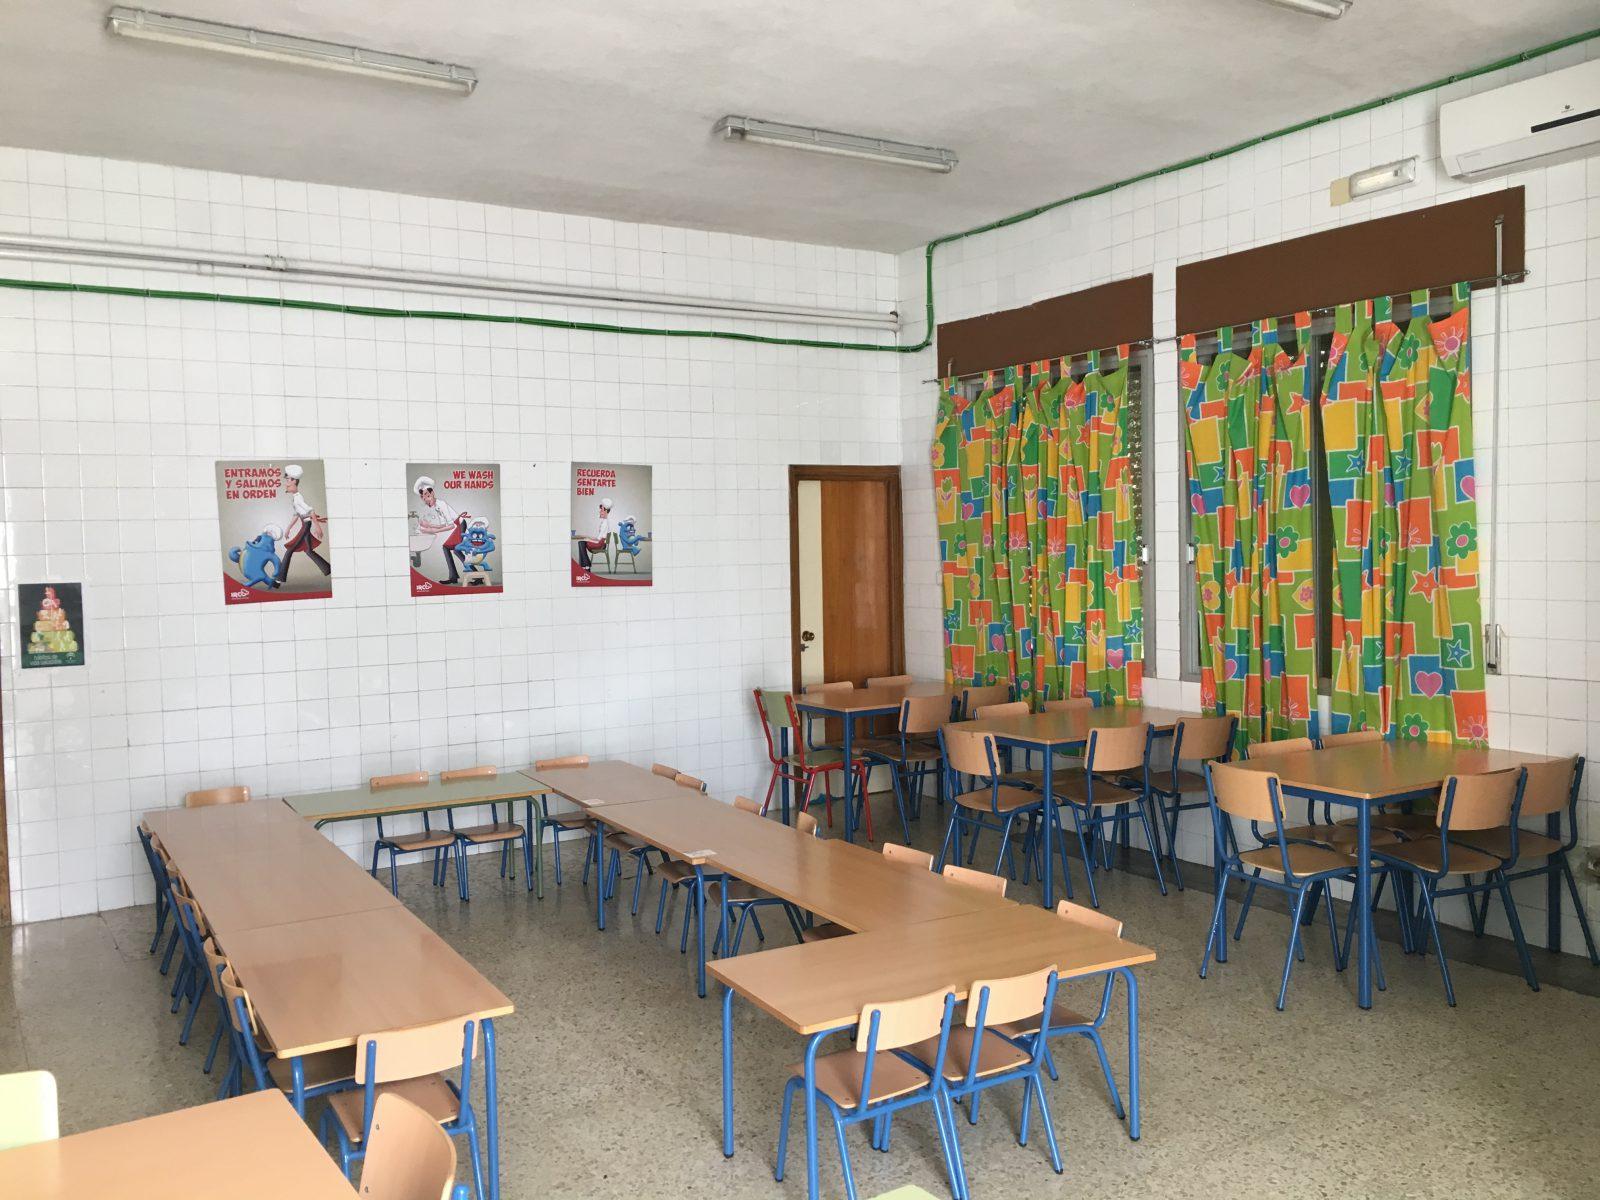 Comedor Escolar Ceip El Olivo Torredonjimeno Ceip El Olivo